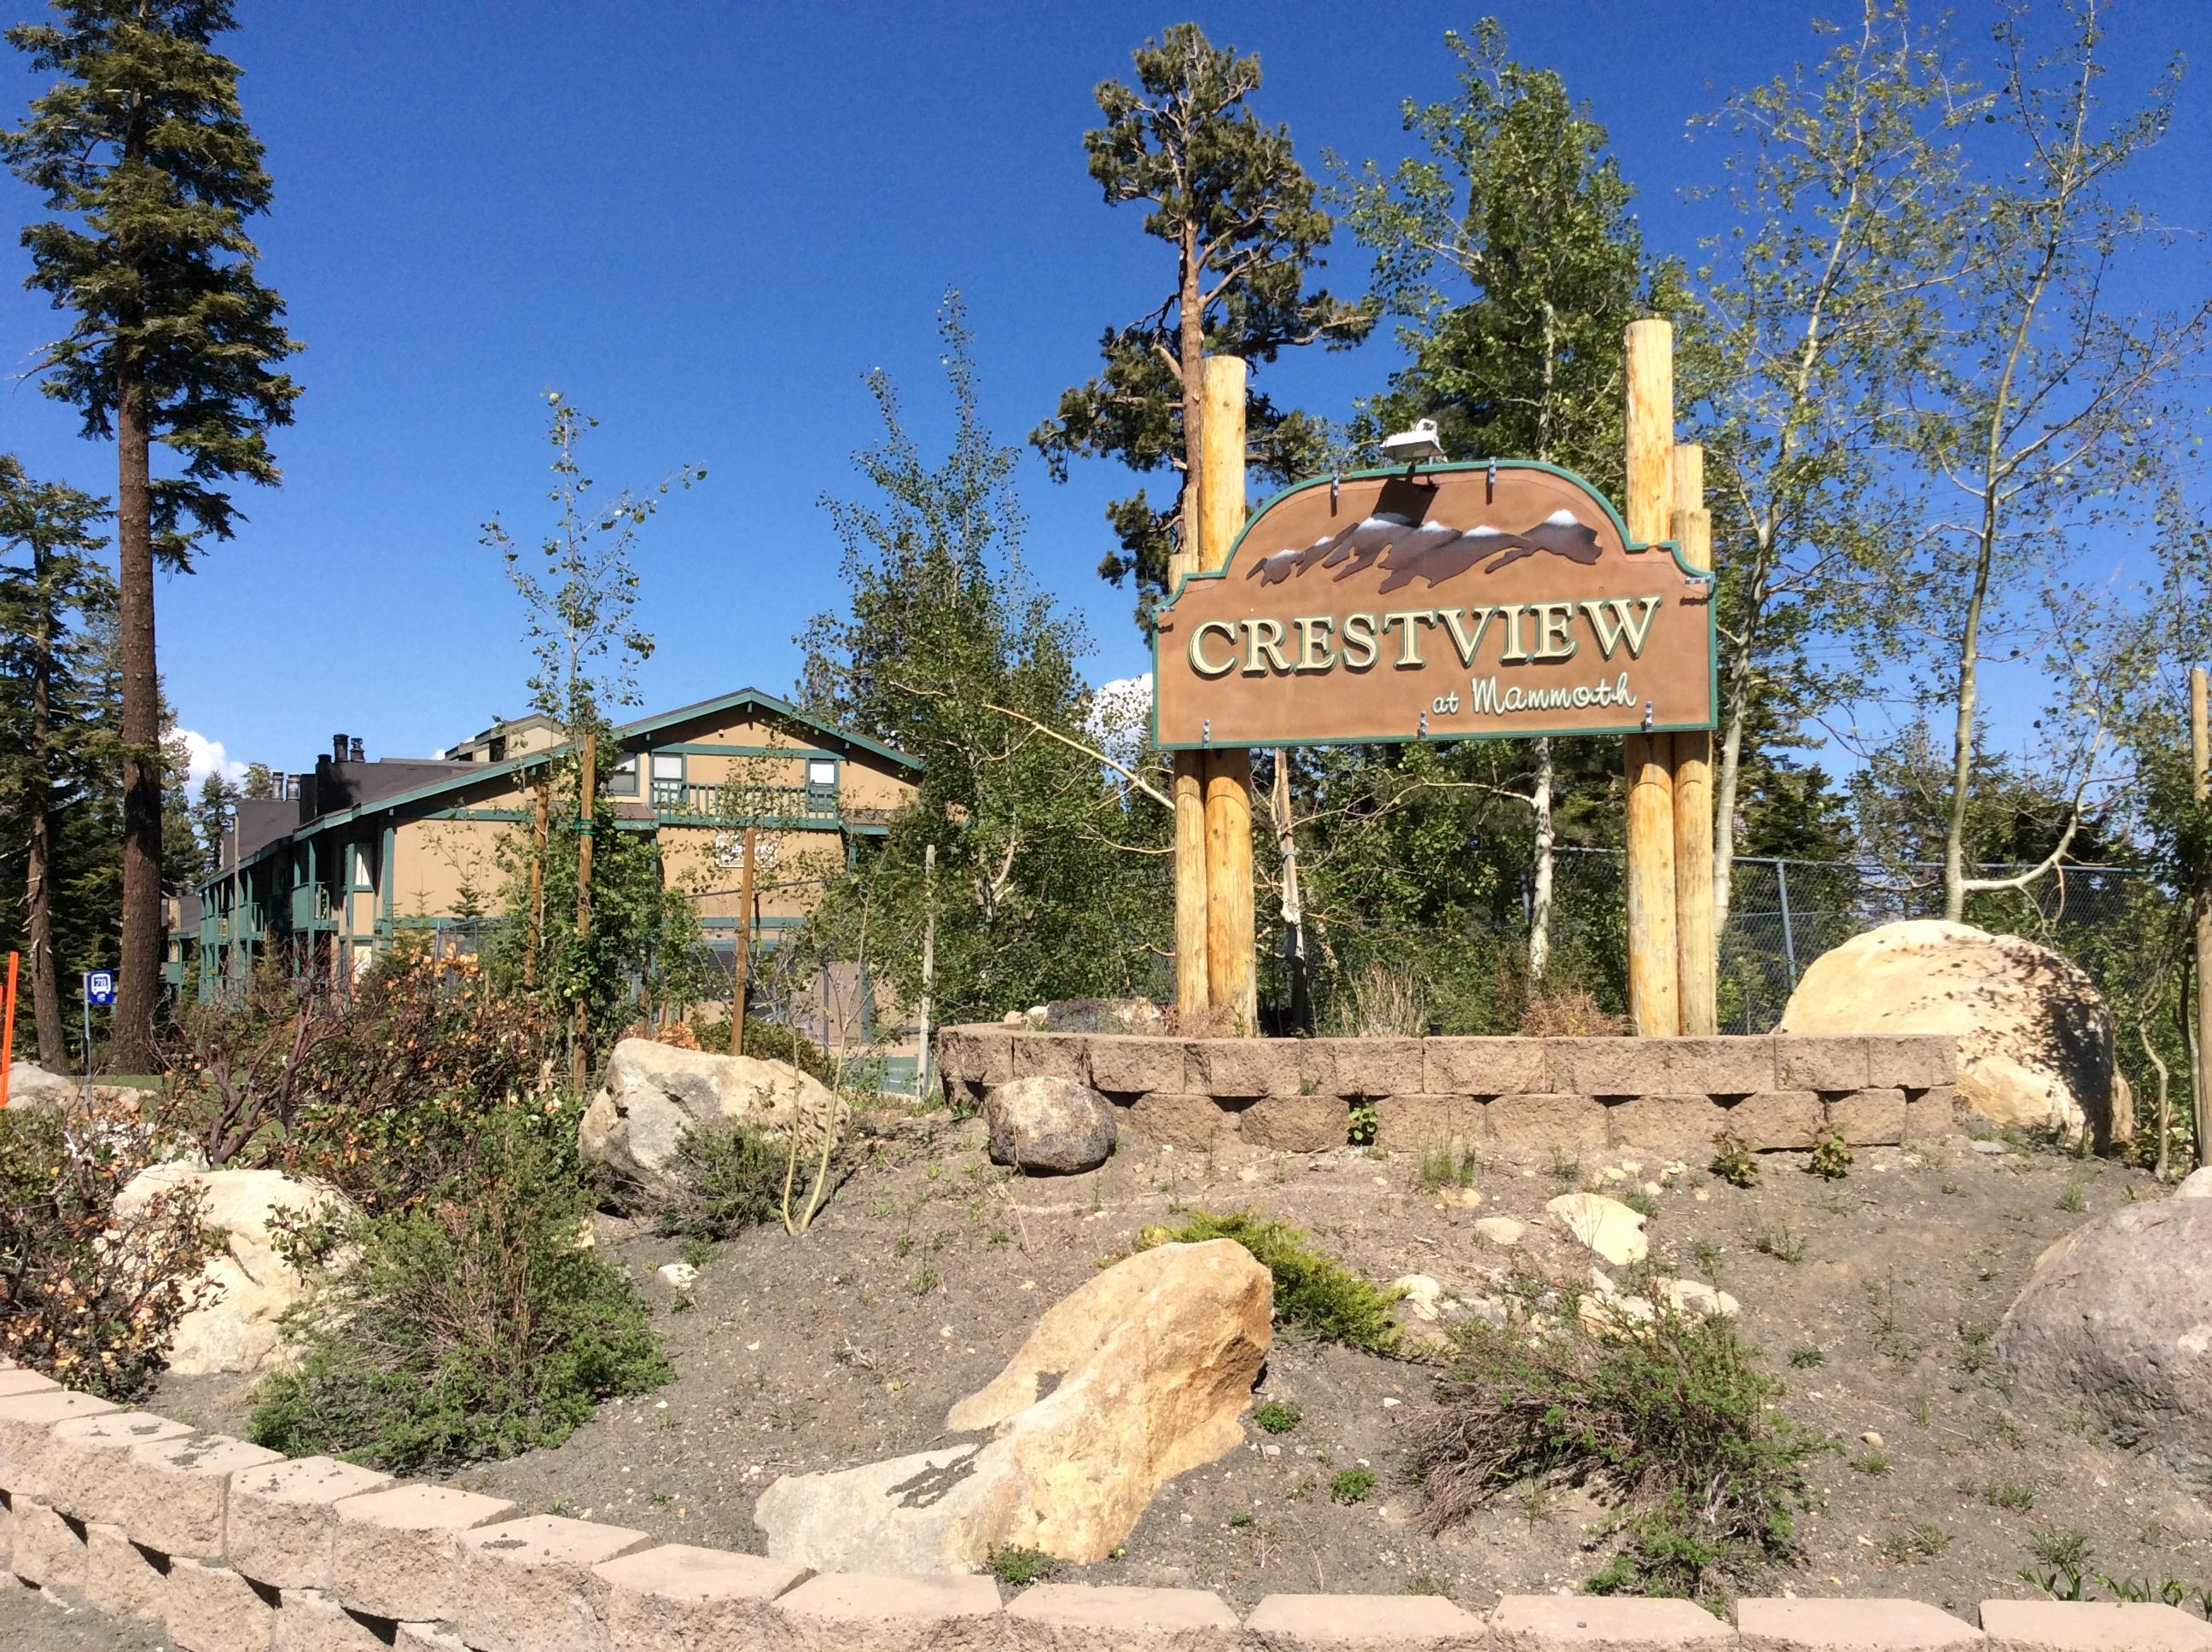 Crestview Complex Sign in Summer